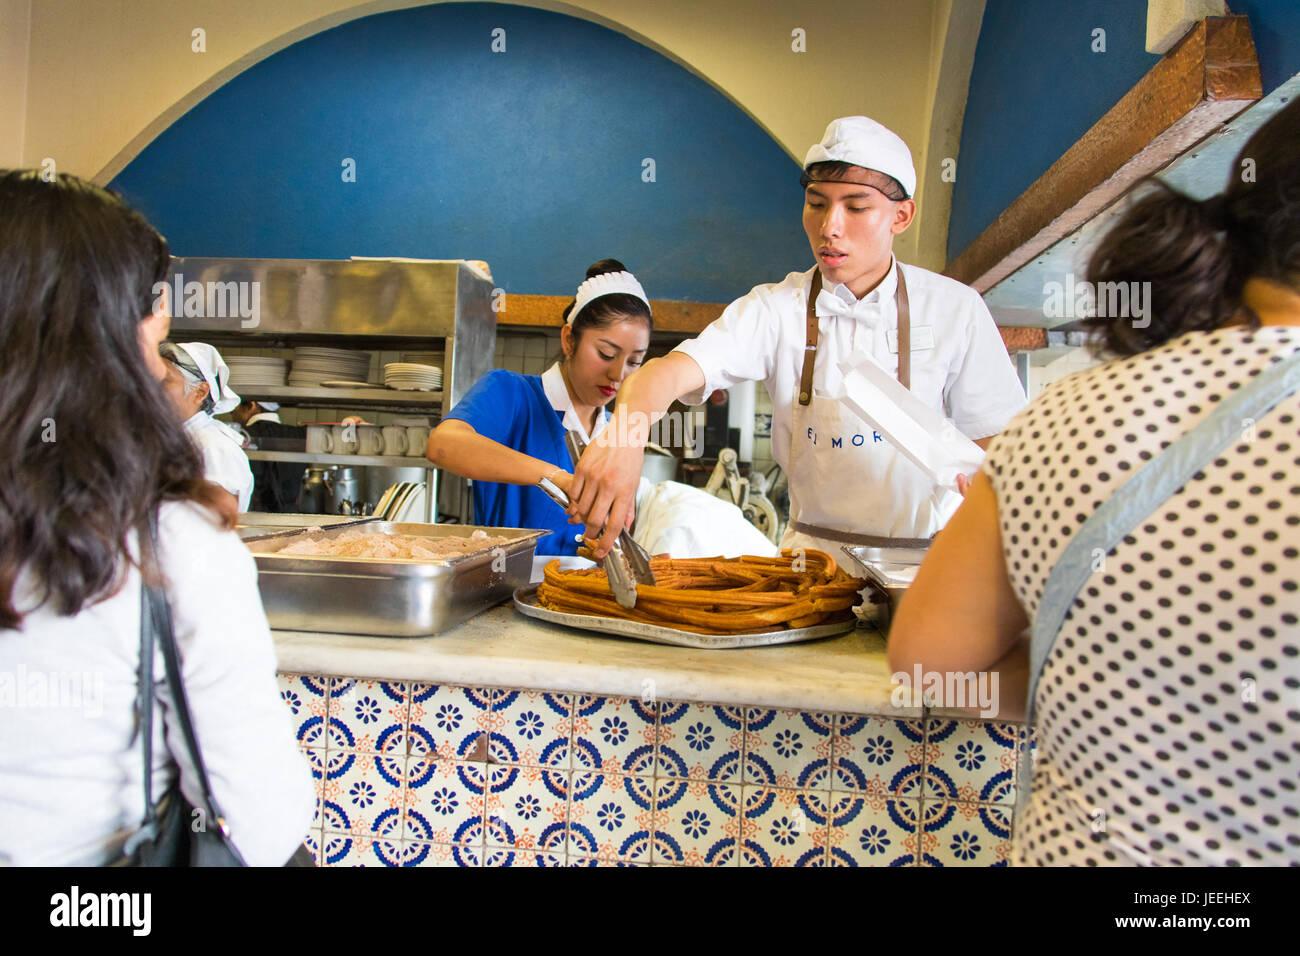 Churros at El Moro Cafe, Mexico City, Mexico Mexico City, Mexico - Stock Image